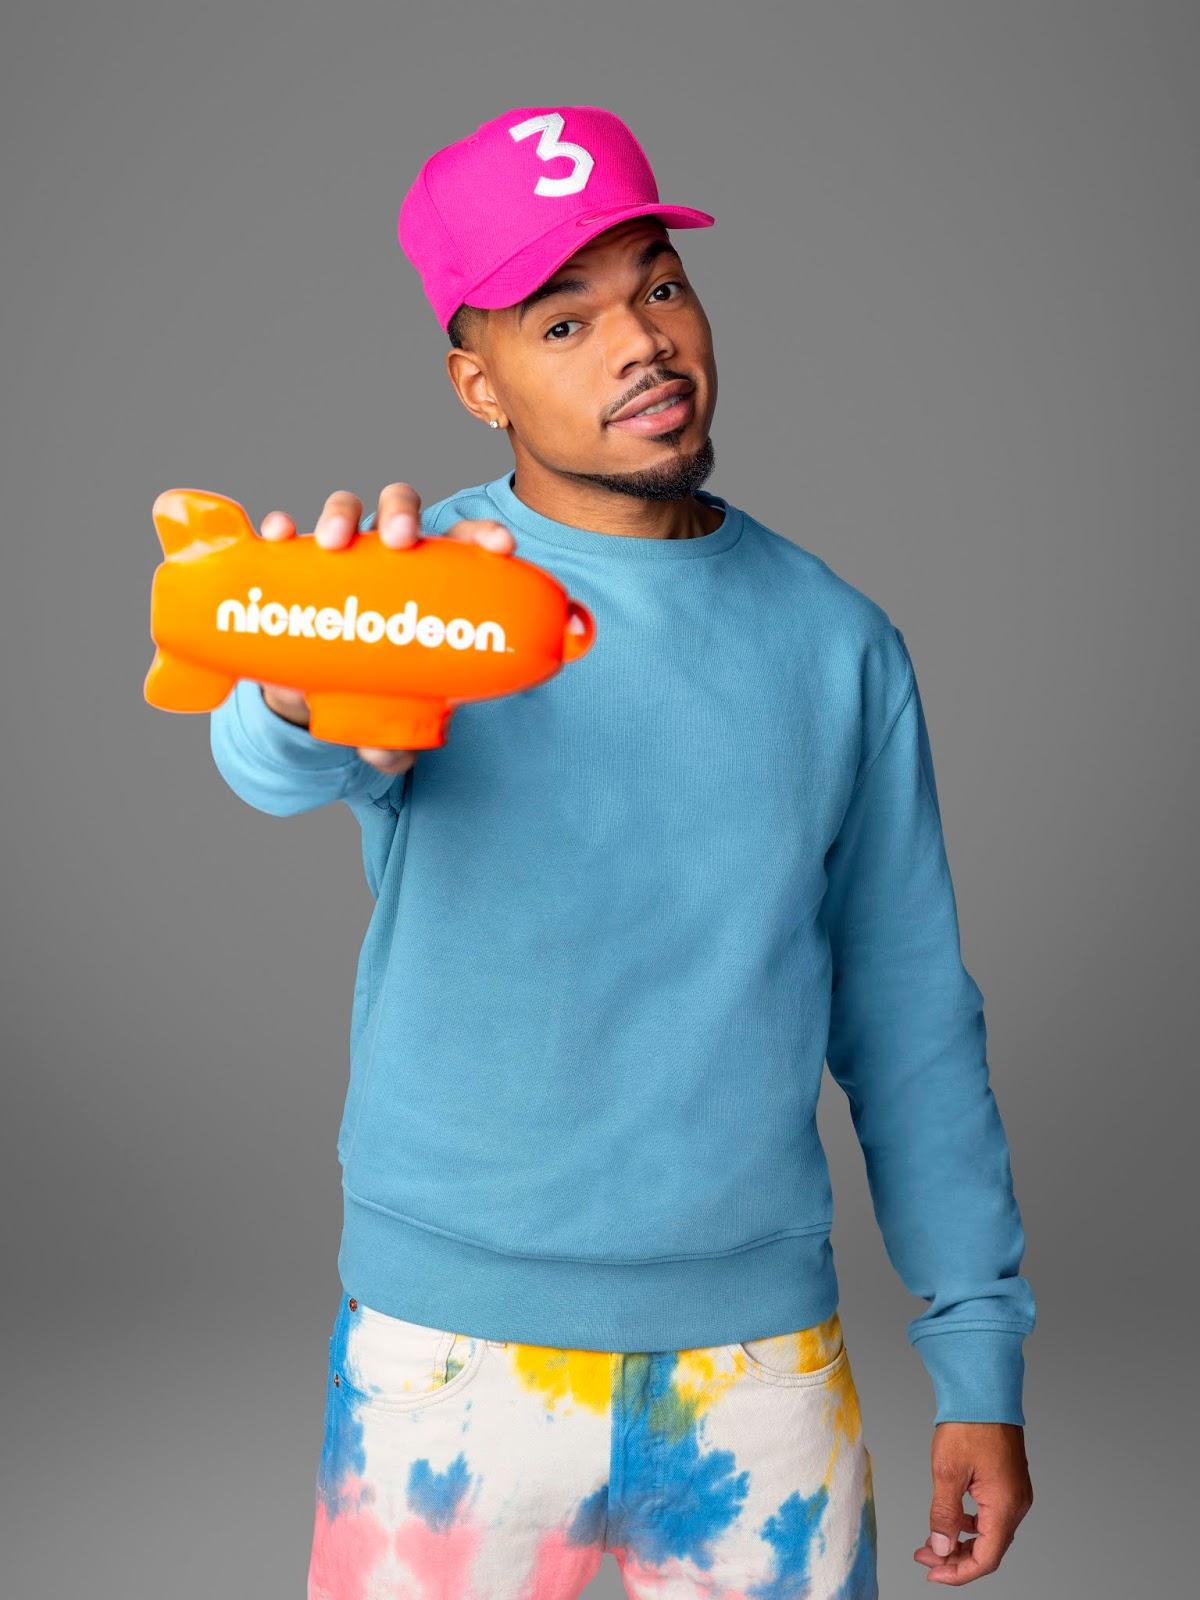 Nickplay Com Vote 2020 : nickplay, NickALive!:, Nickelodeon, Announces, Kids', Choice, Awards, Nominees